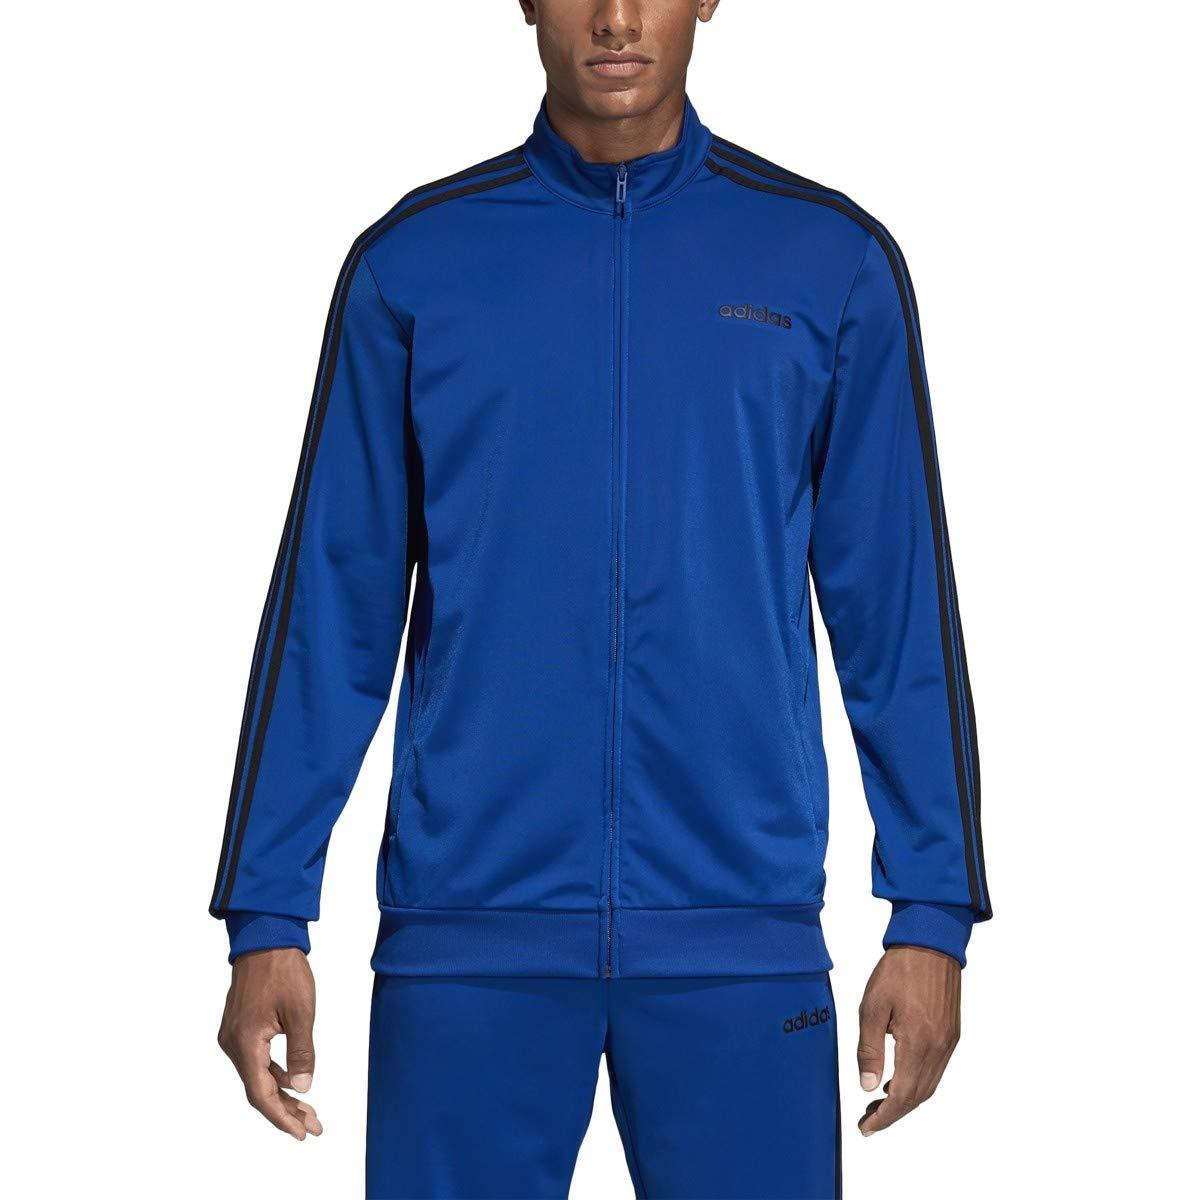 adidas Essentials 3 Stripes Tricot Track Top, Collegiate Royal/Black, MT by adidas